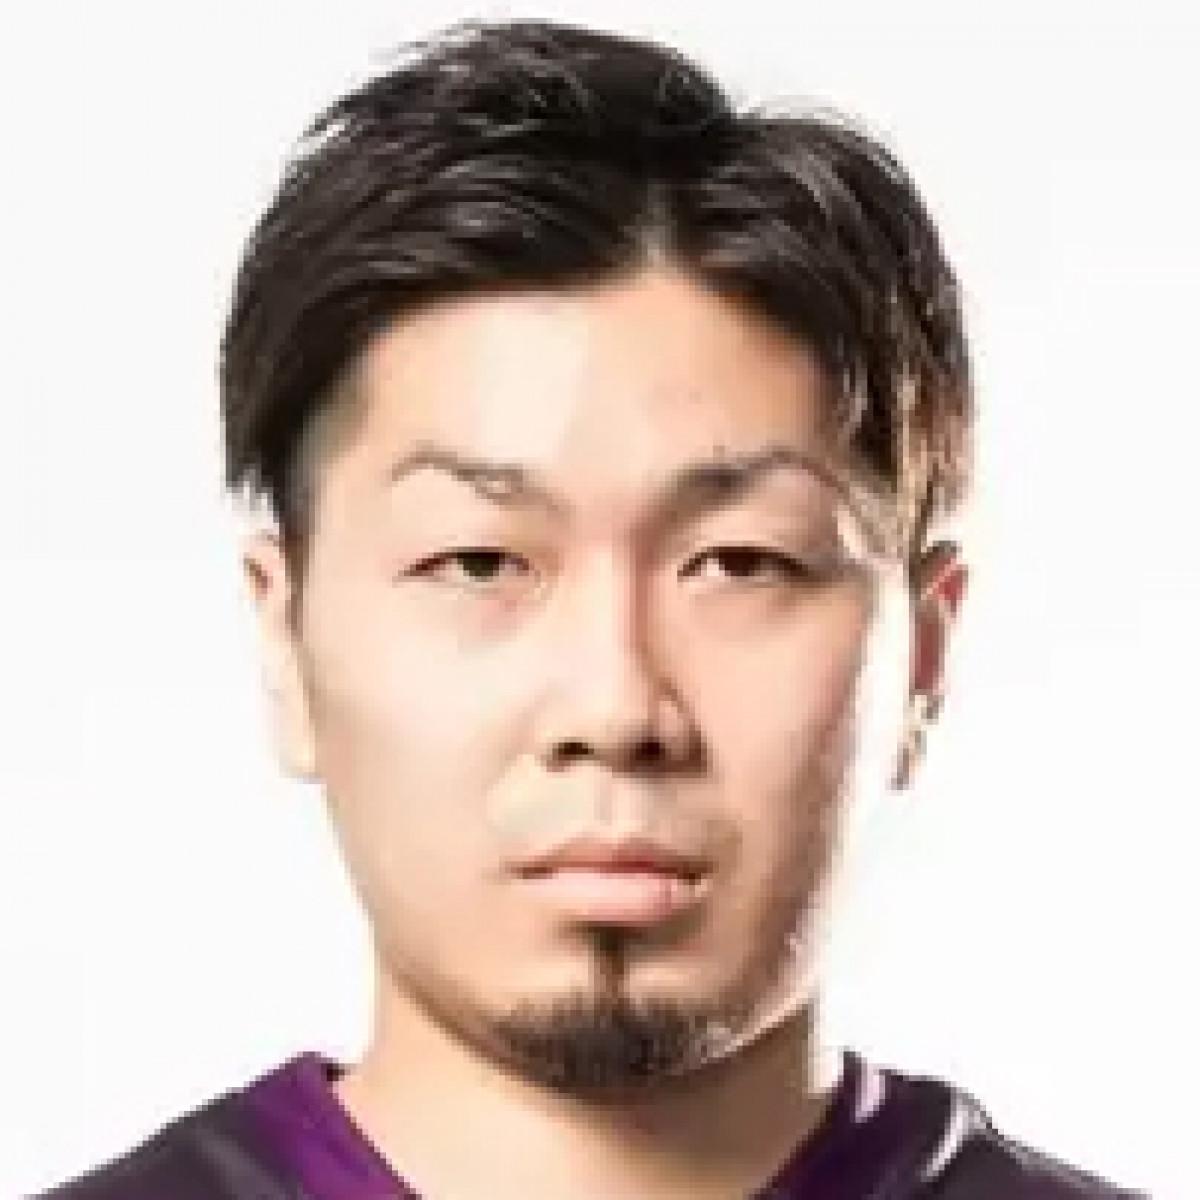 Hiroki Furuhashi